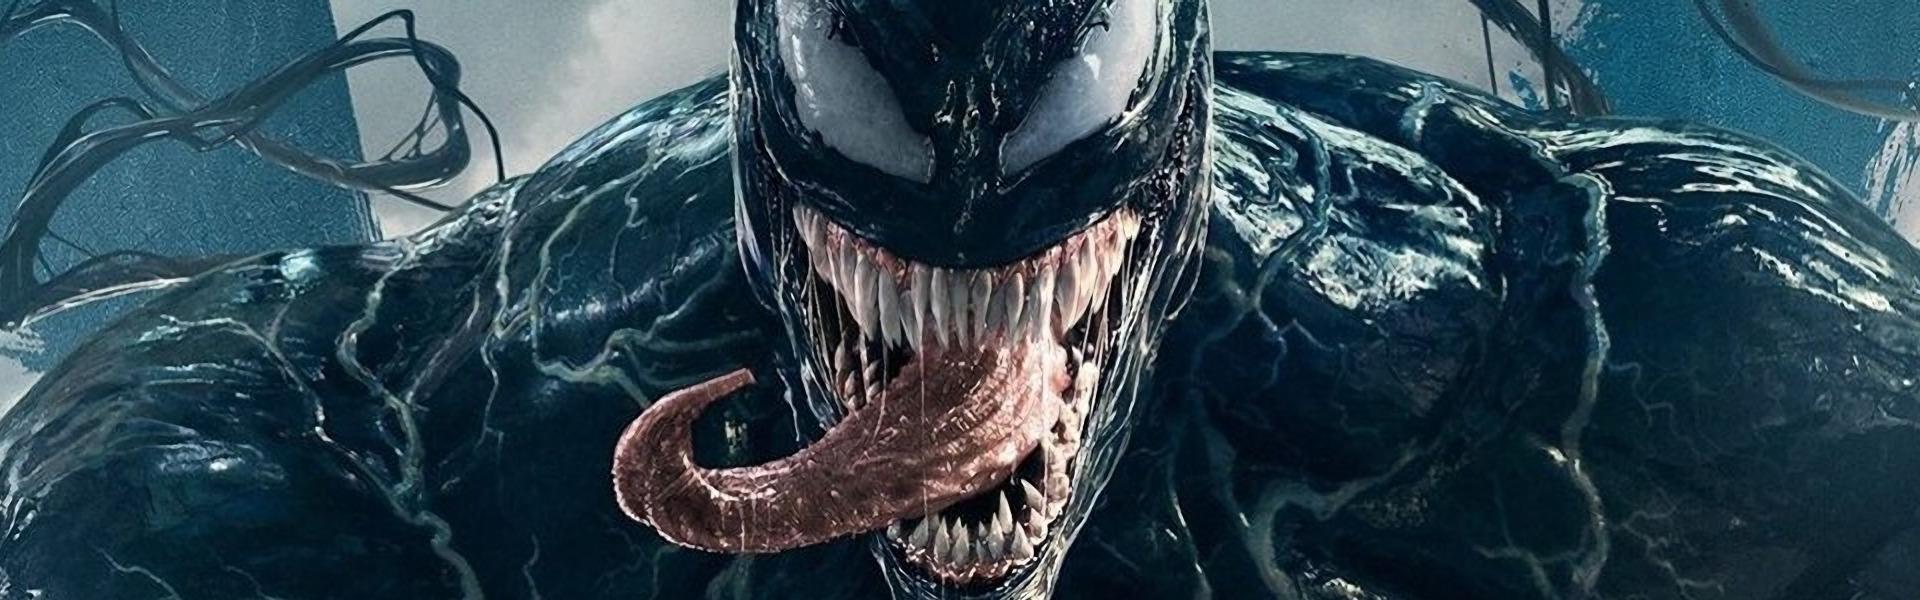 Venom 2: Carnage <span>(dubbing)</span>